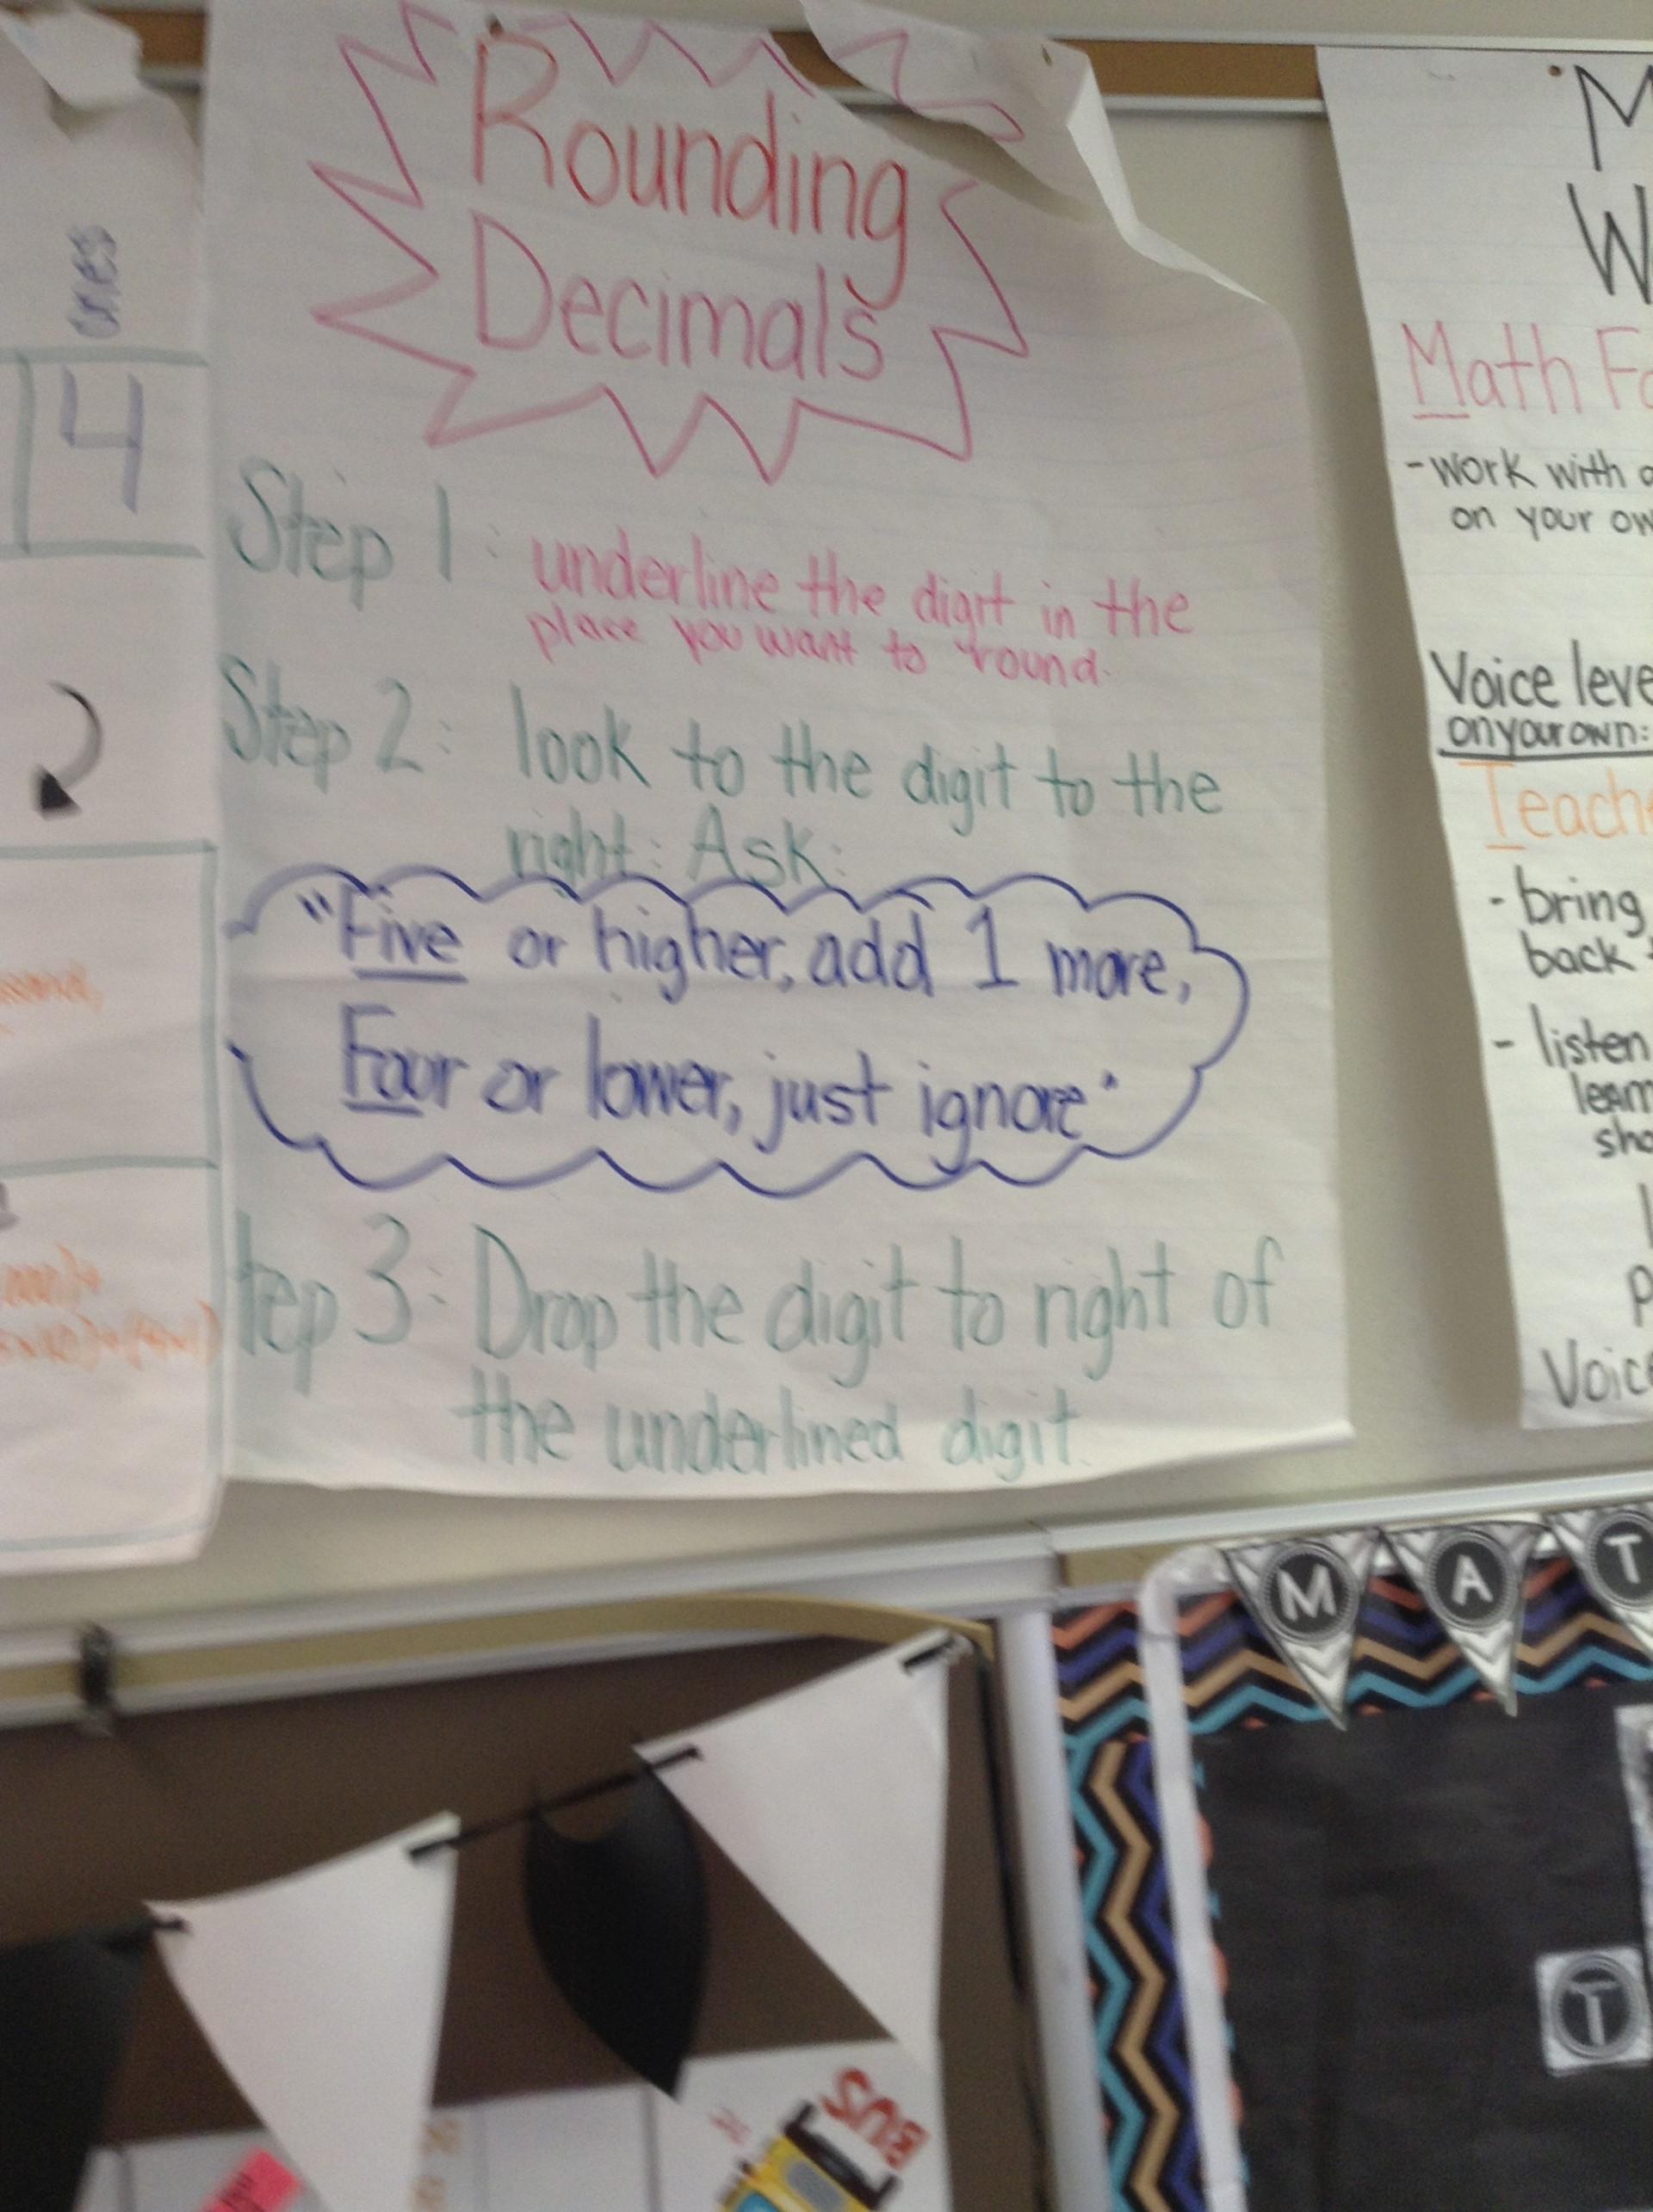 How to round decimals